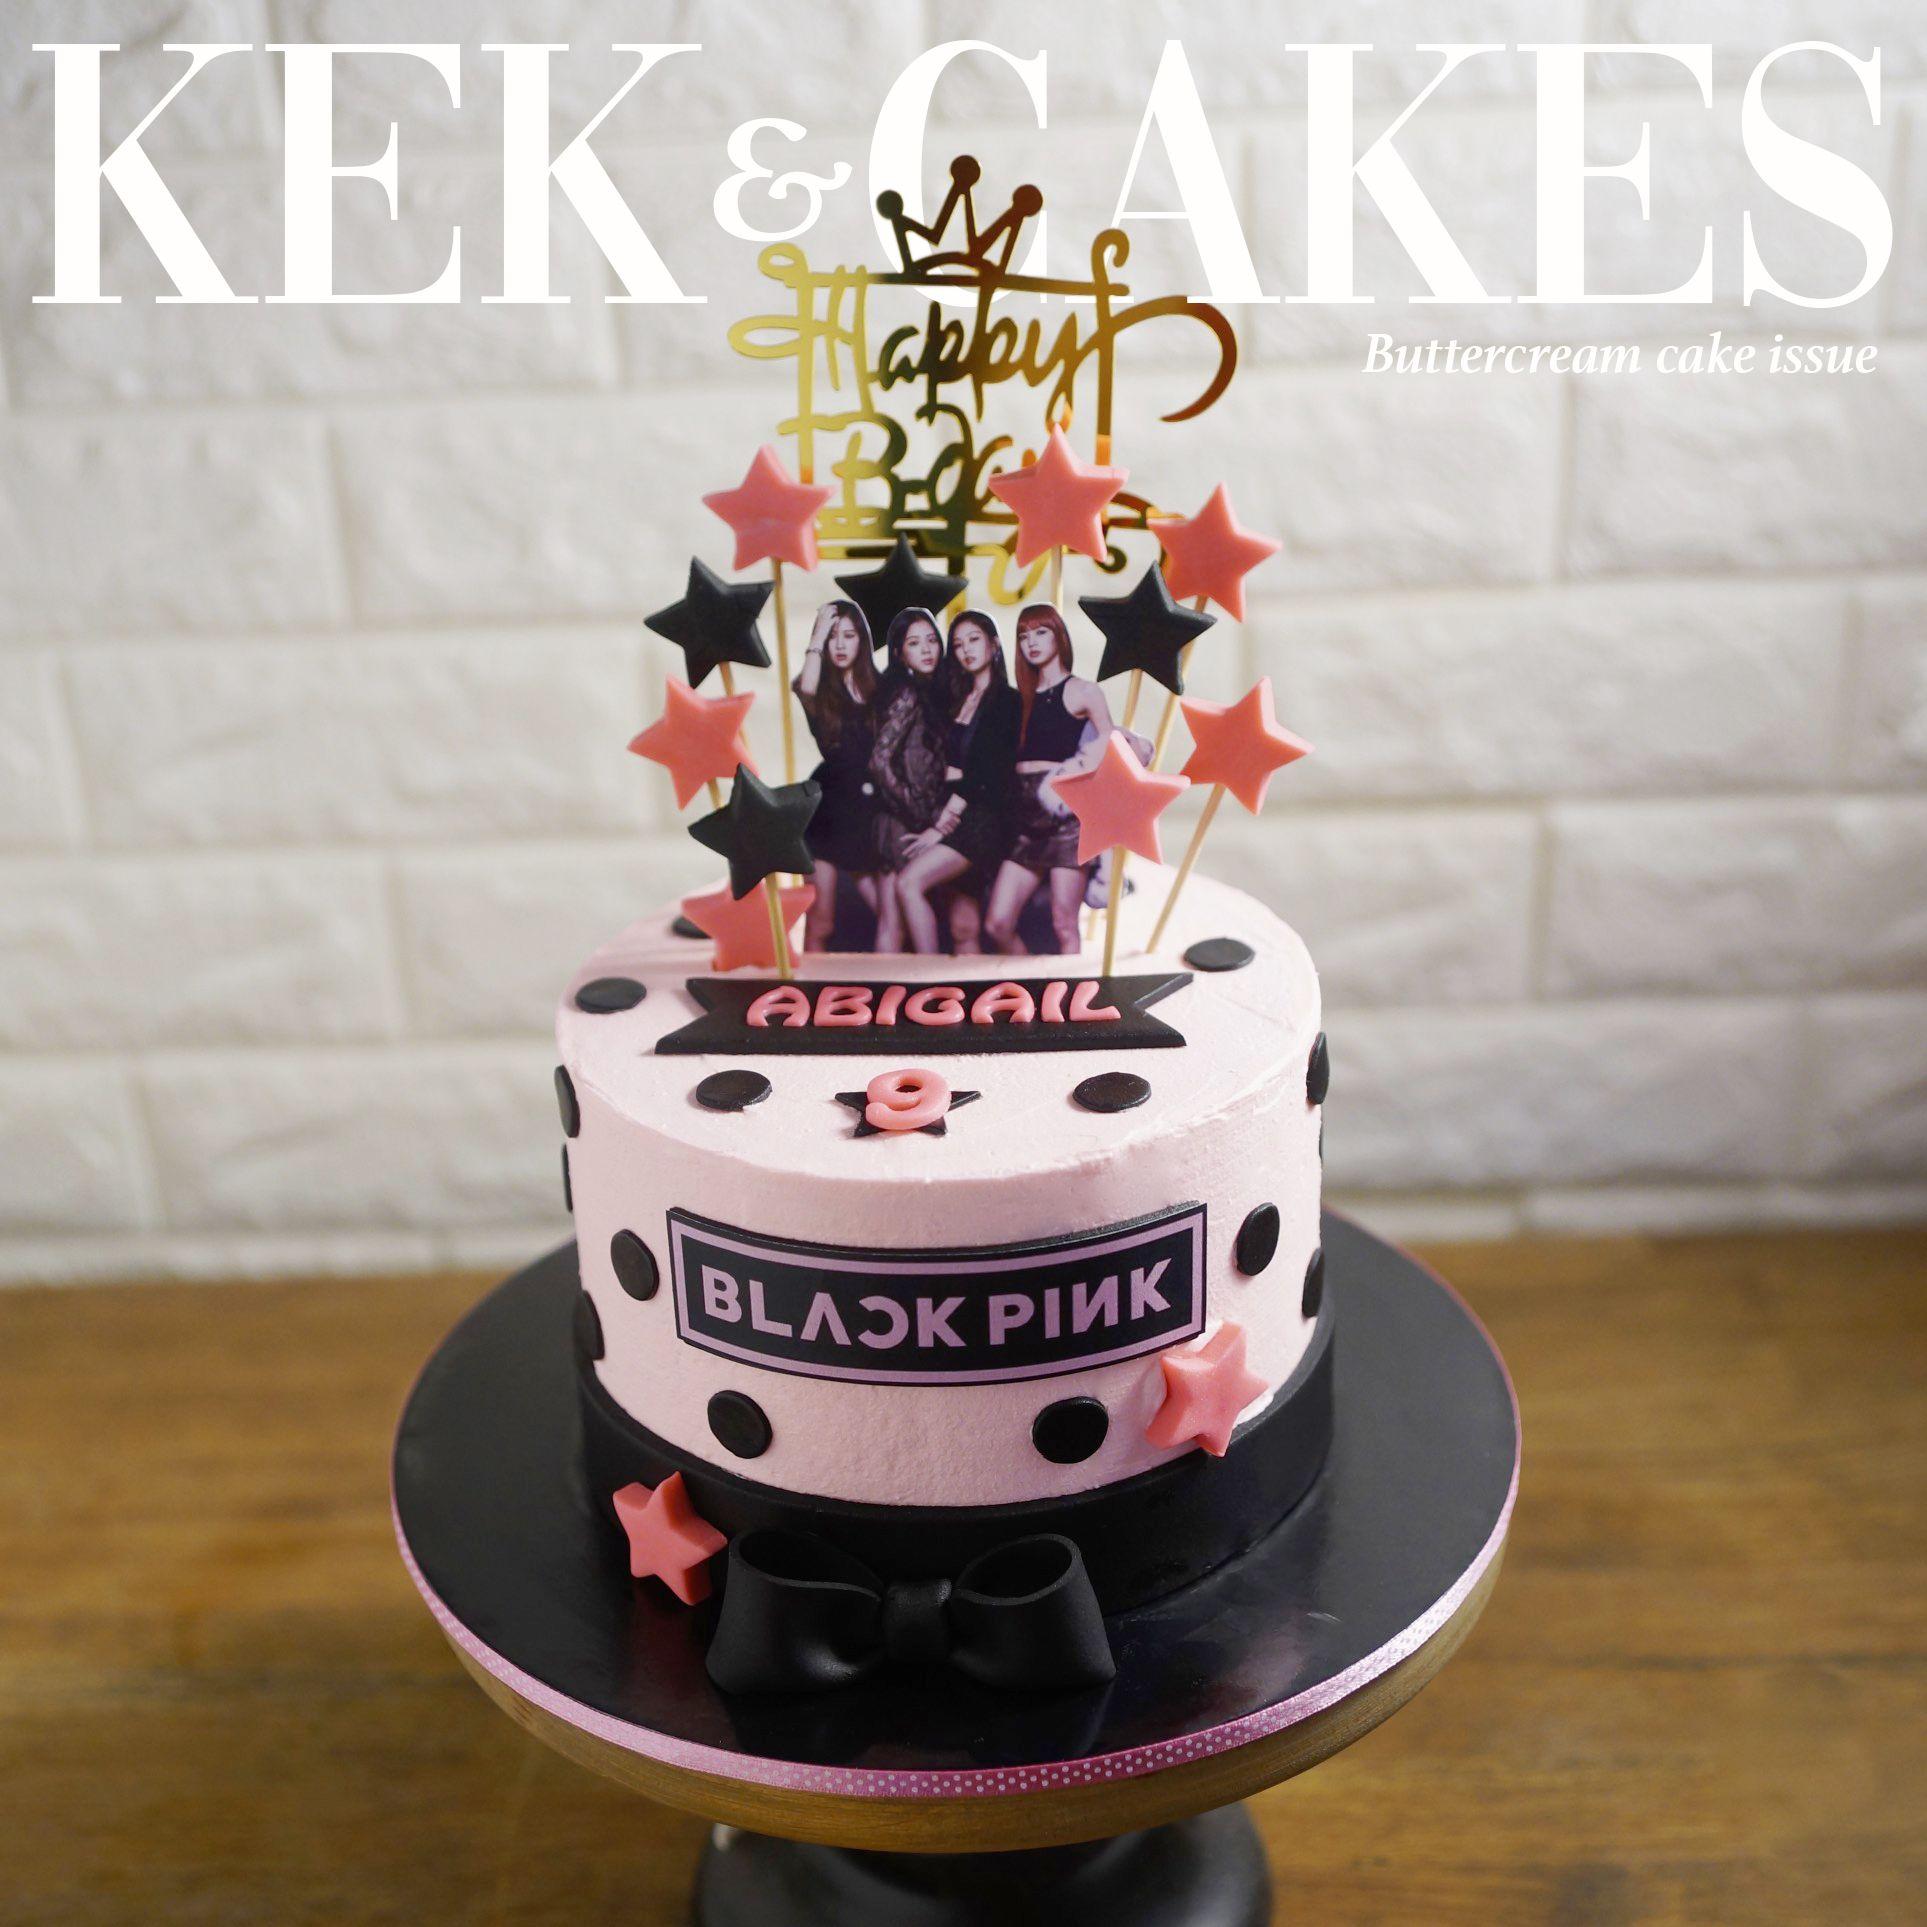 Blackpink Buttercream Cake Cake Buttercream Cake Birthday Party Cake